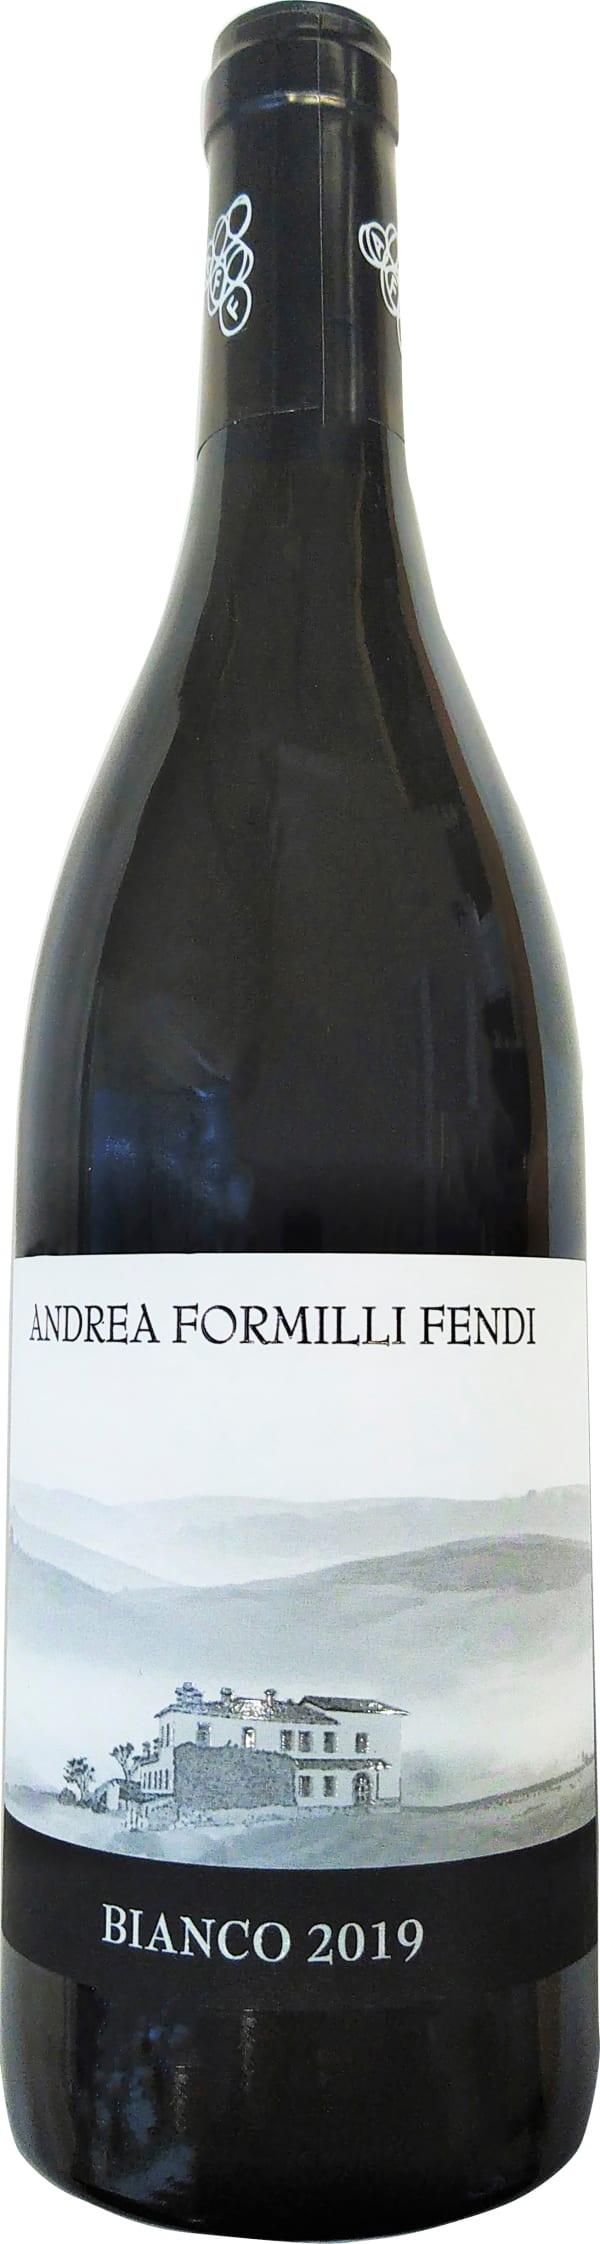 Andrea Formilli Fendi Bianco 2019